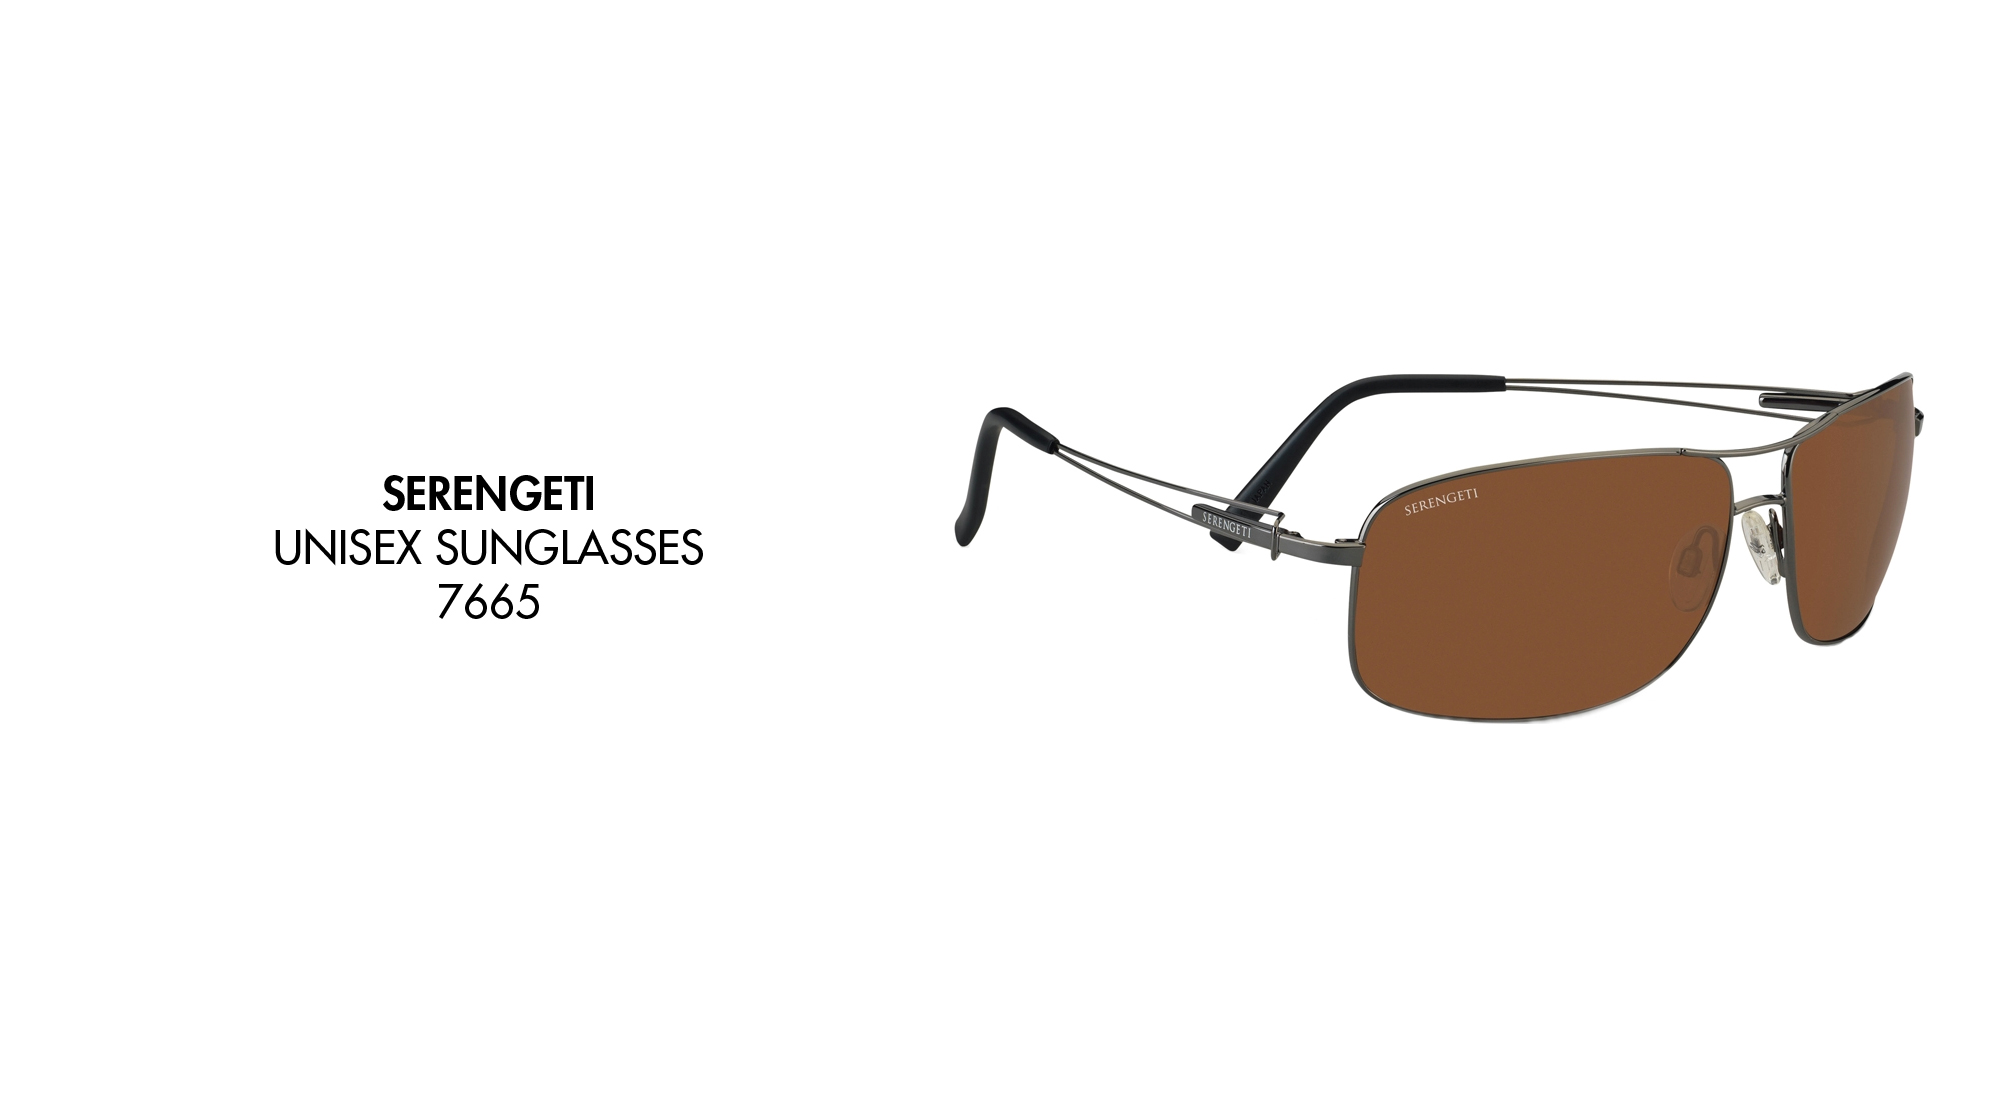 8a2f31ee3d85 Serengeti 7301 Granada Satin Black Polarized 555nm Sunglasses- £148